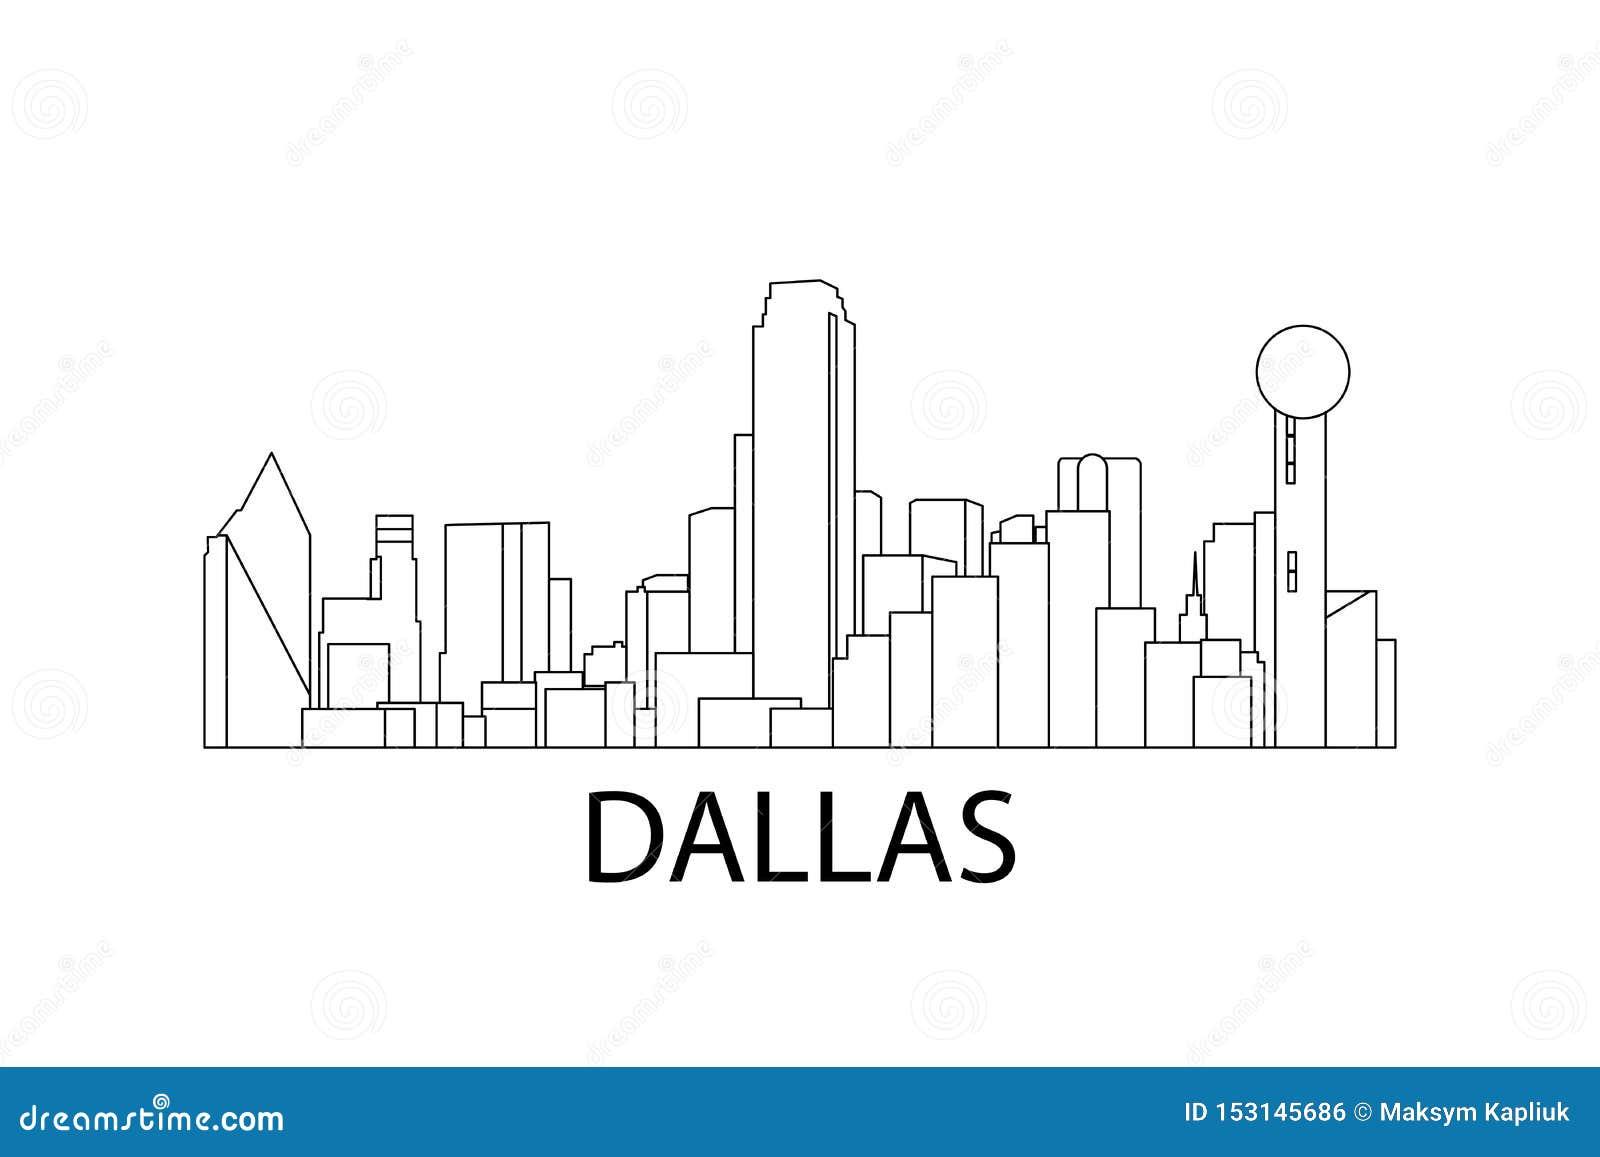 Dallas Skyline Ilustraci?n del vector Dallas, Tejas, los E.E.U.U.